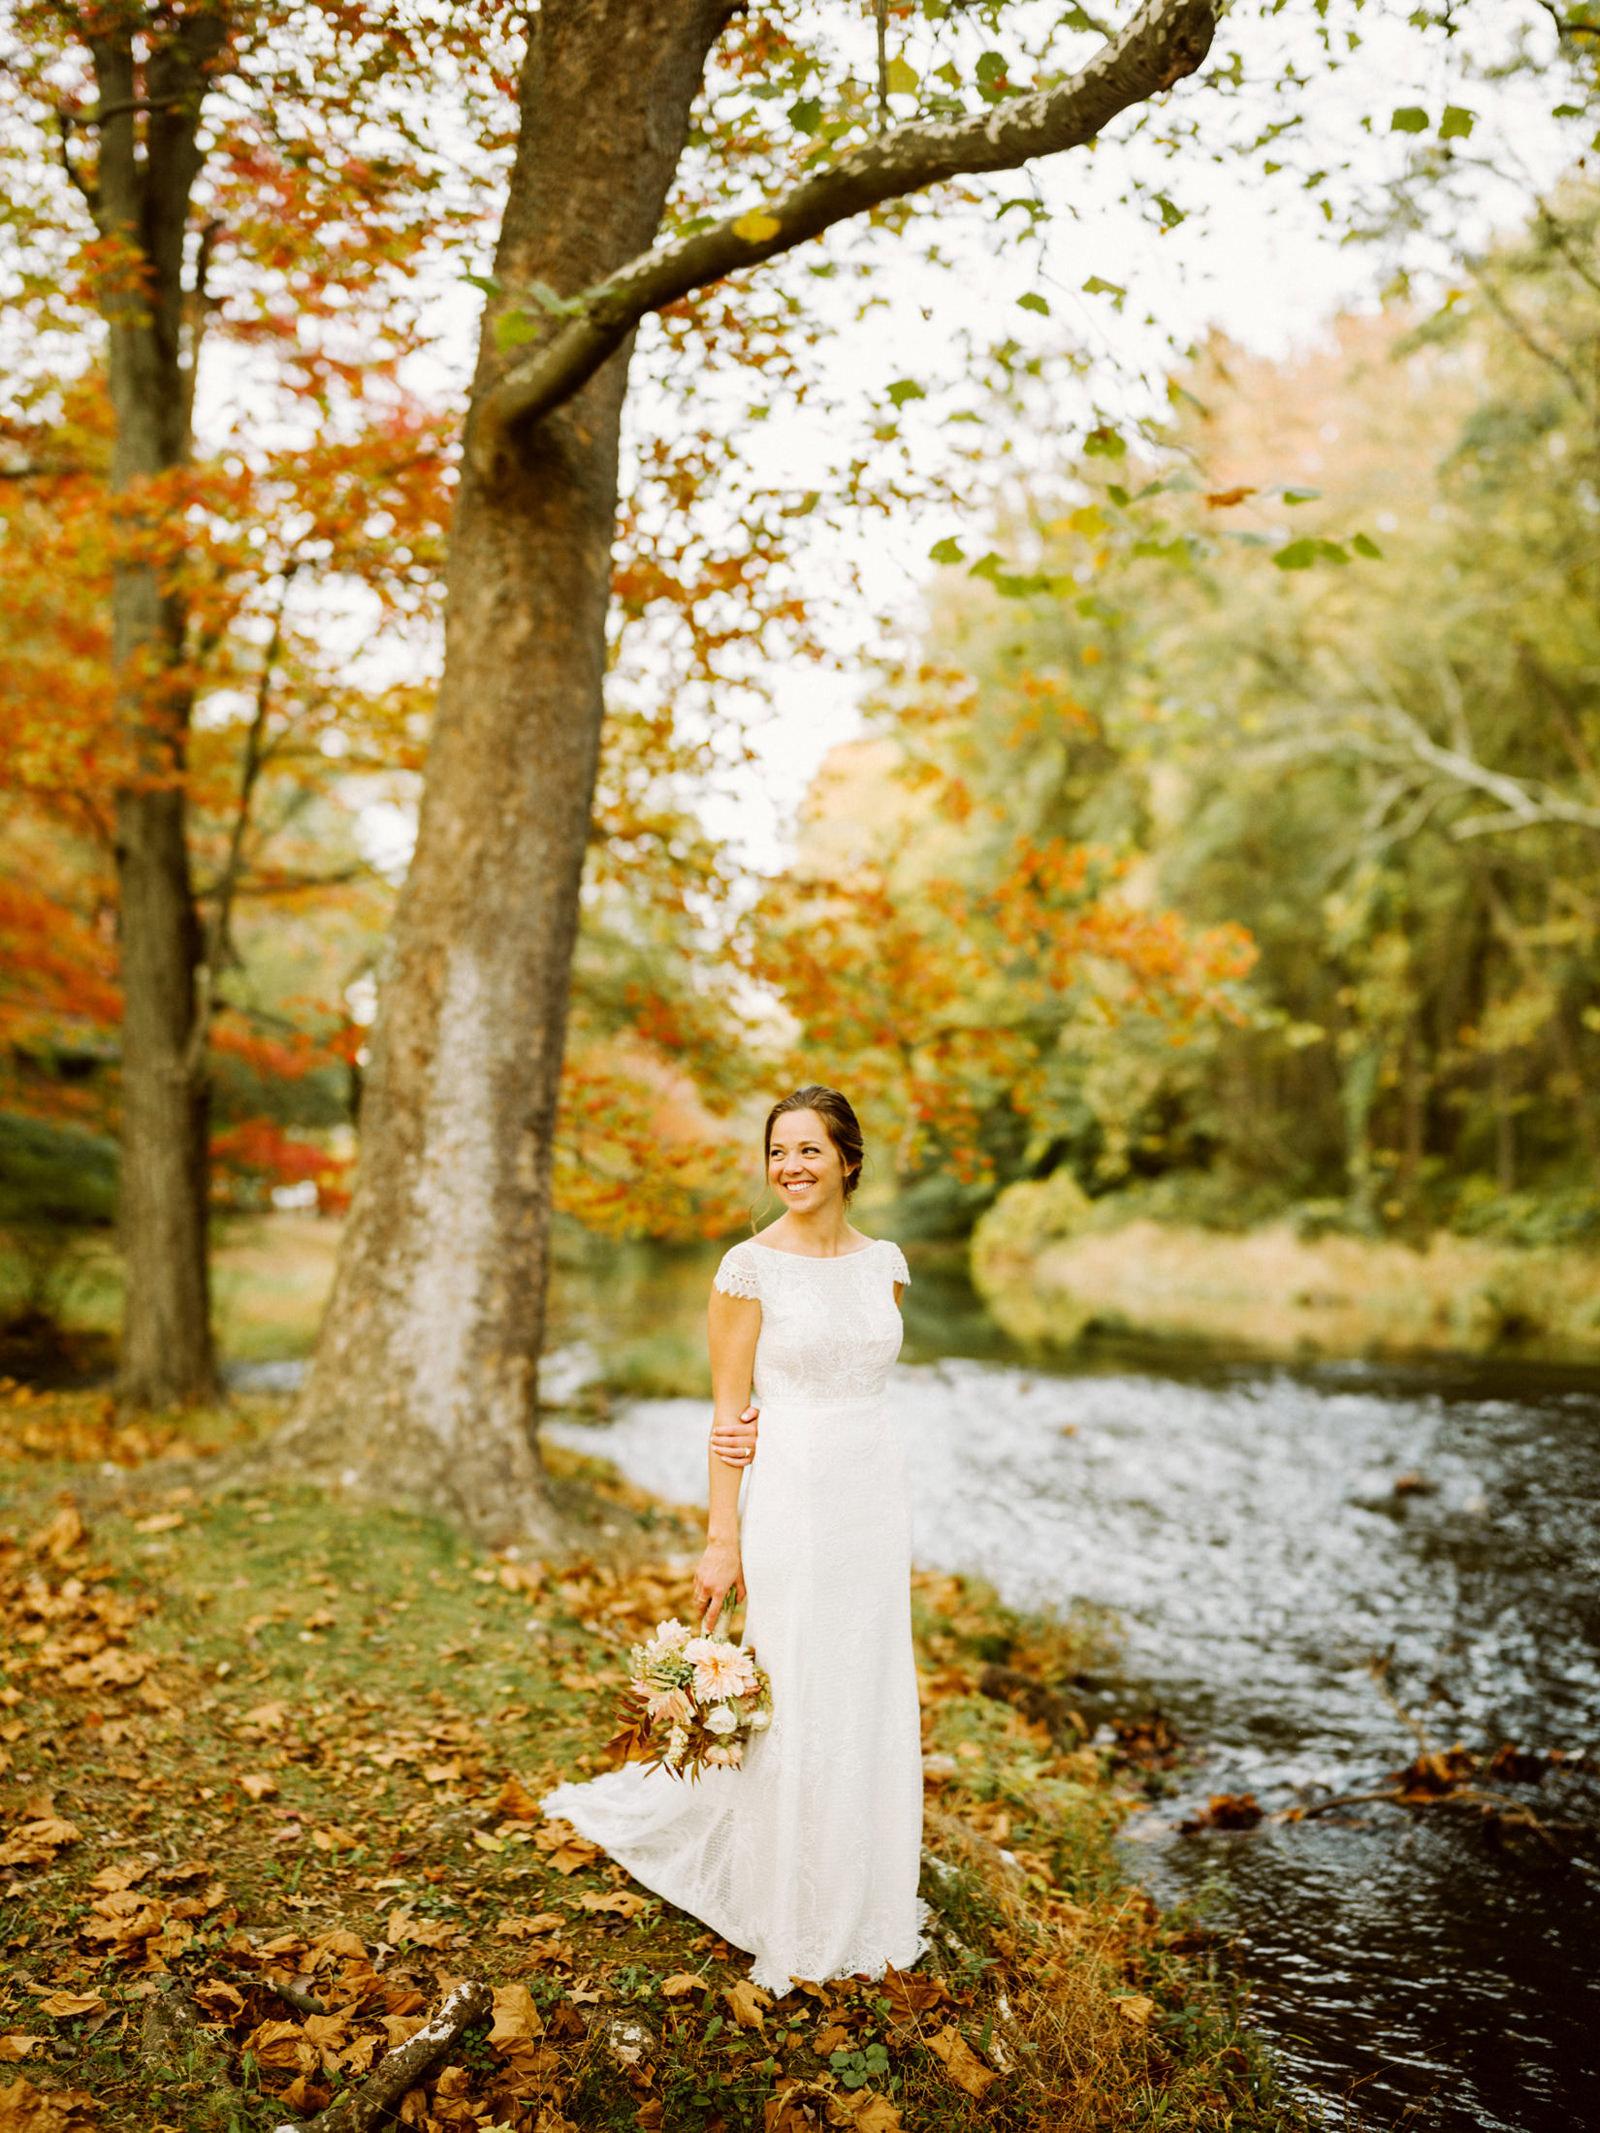 bridgeport-wedding-111 BRIDGEPORT, CONNECTICUT BACKYARD WEDDING